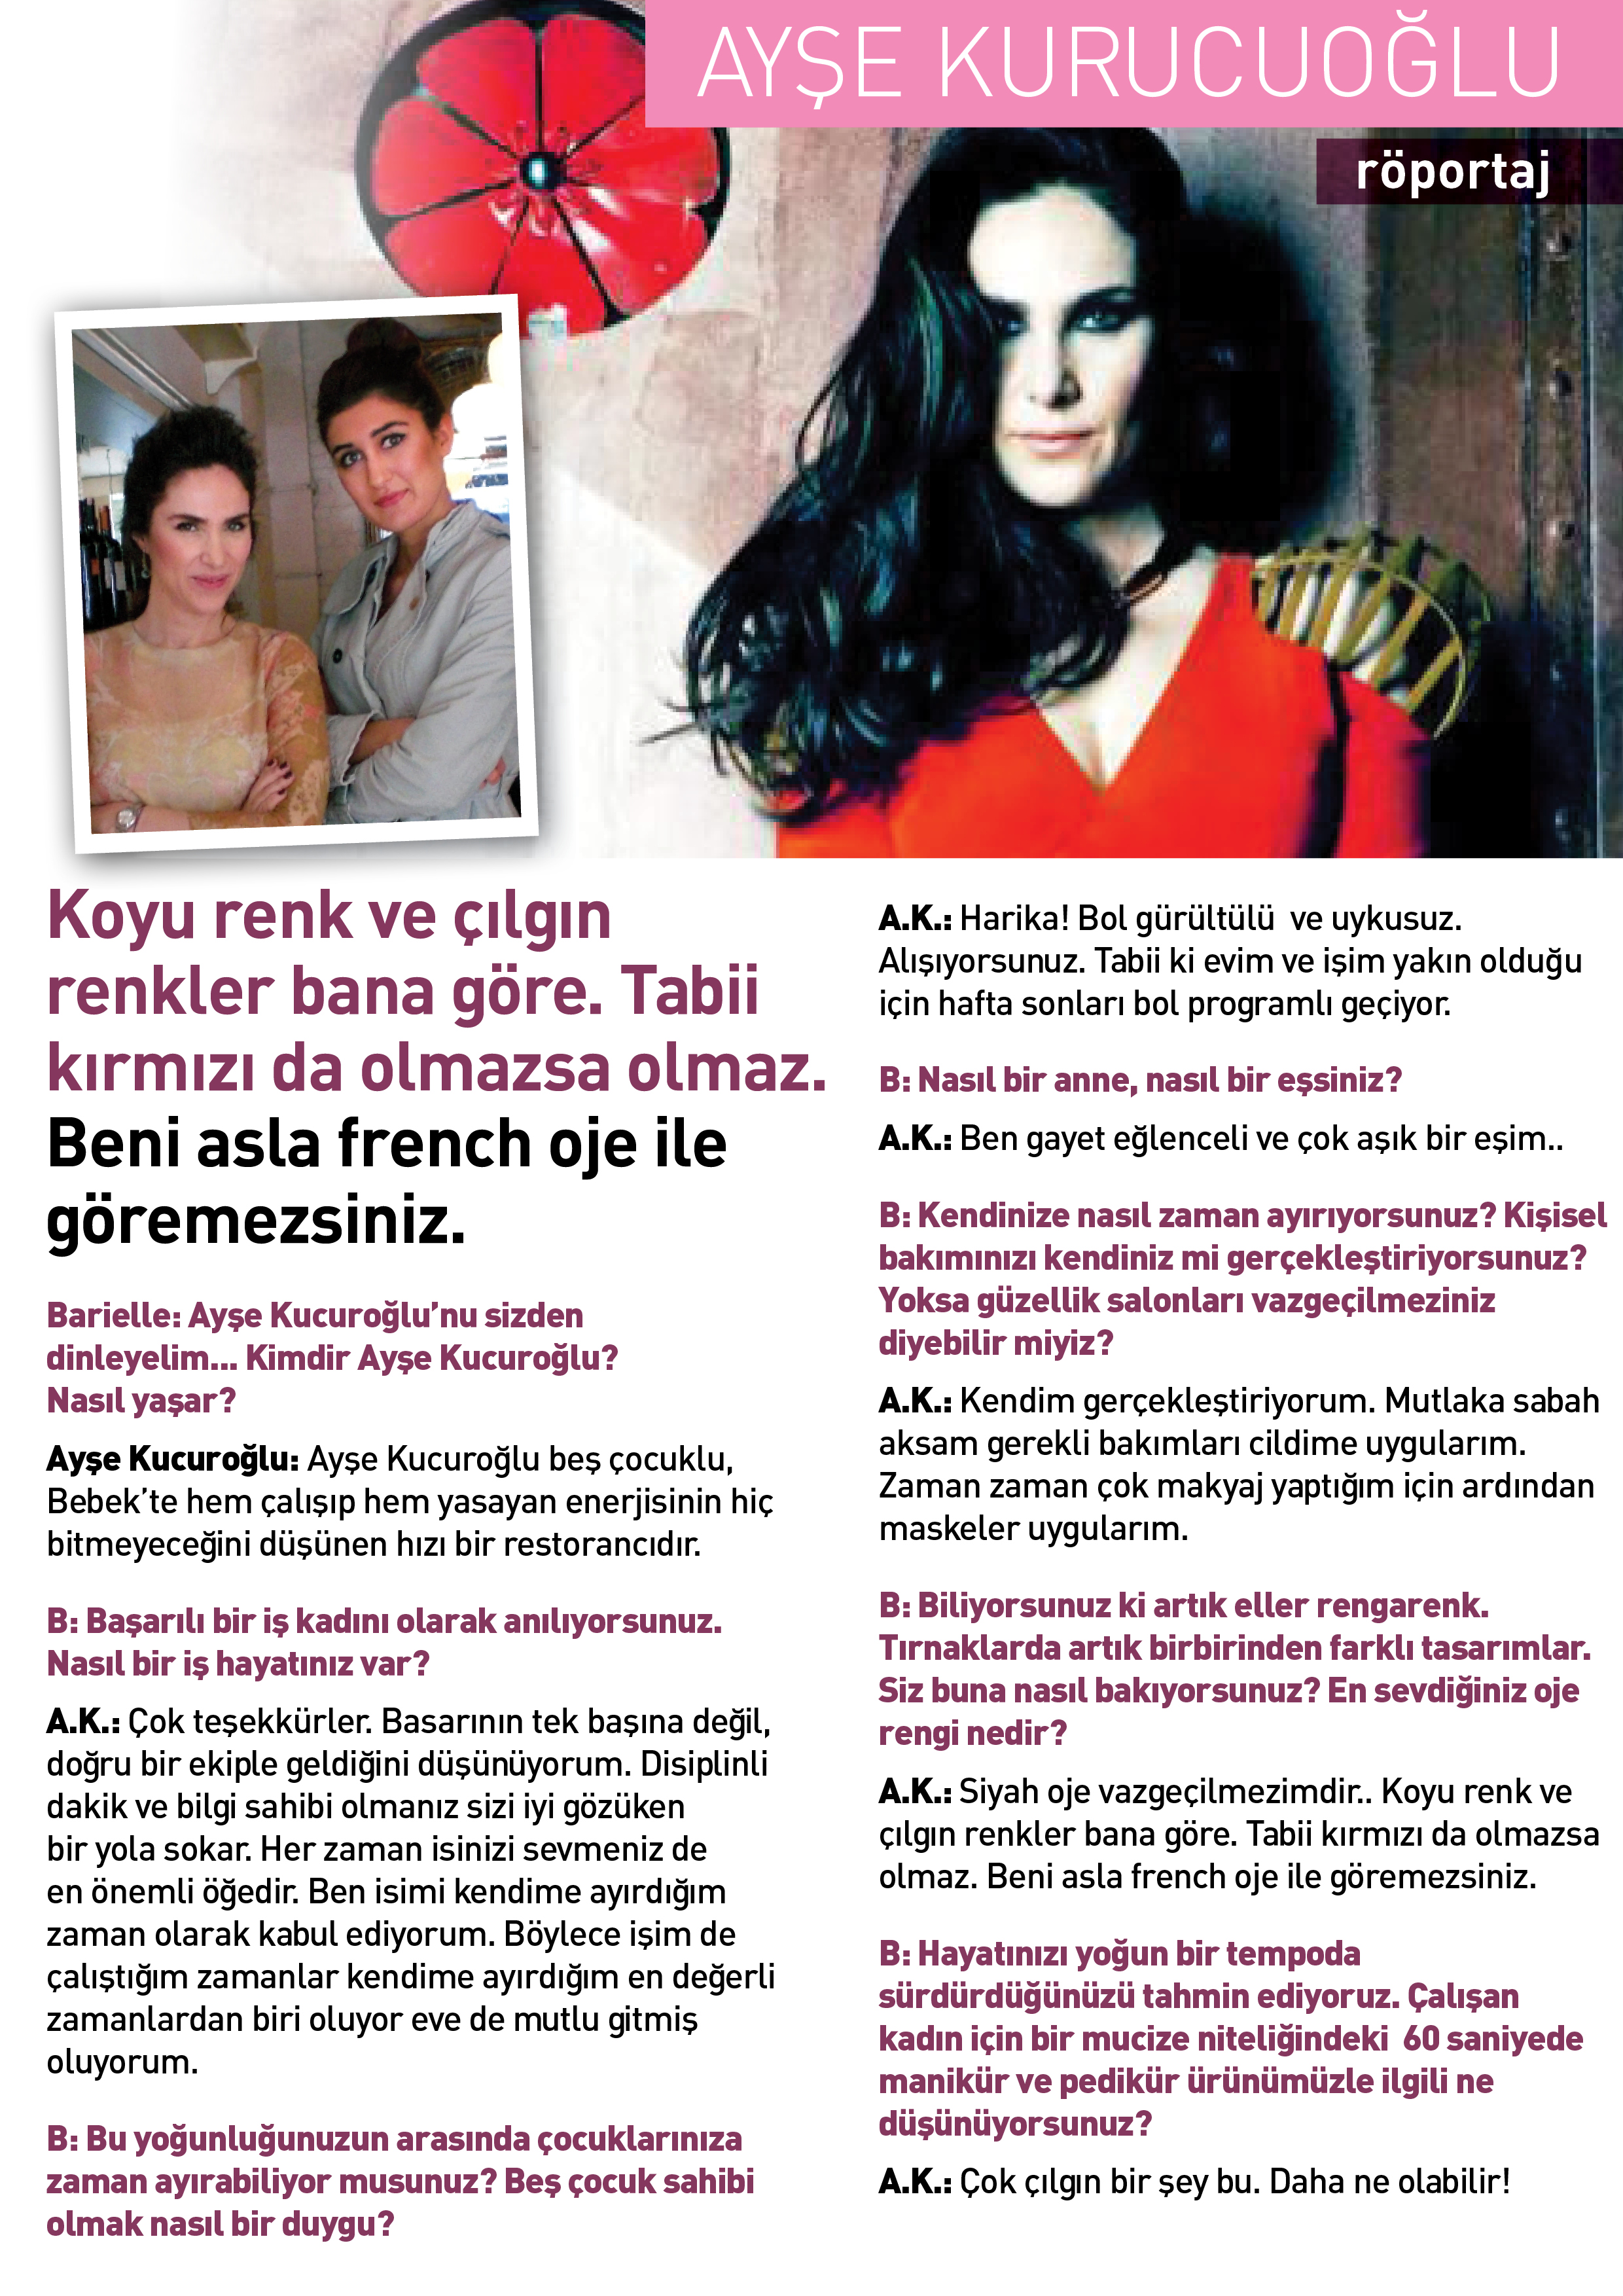 Ayşe Kucuroğlu Barielle Röportajı